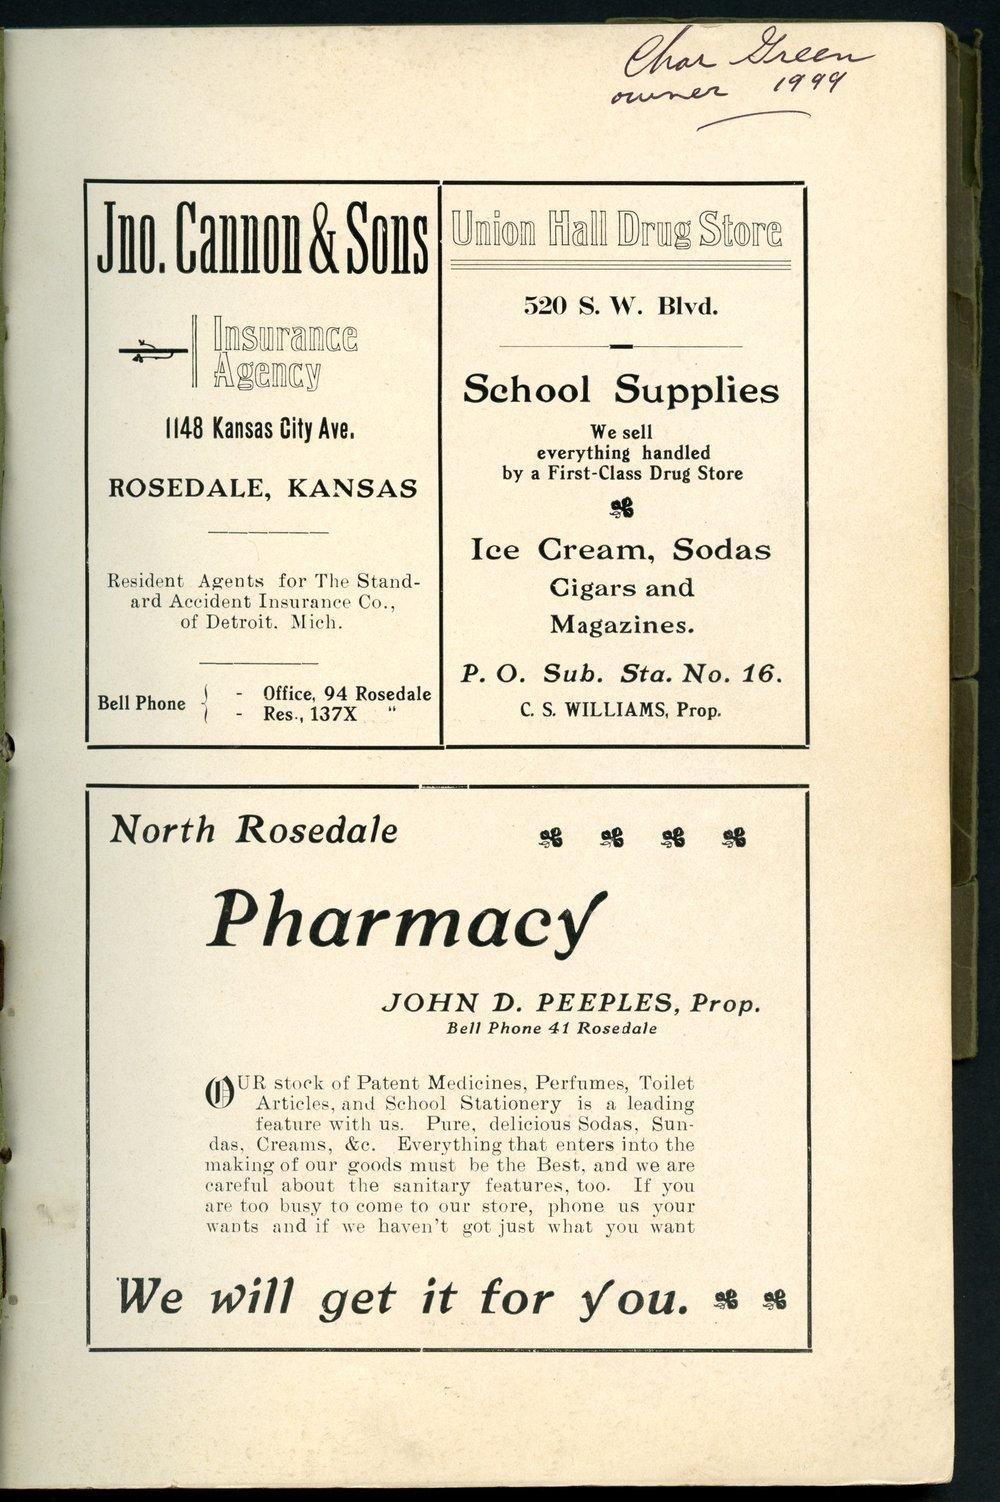 Mount Marty yearbook, 1910, Rosedale, Kansas - 1